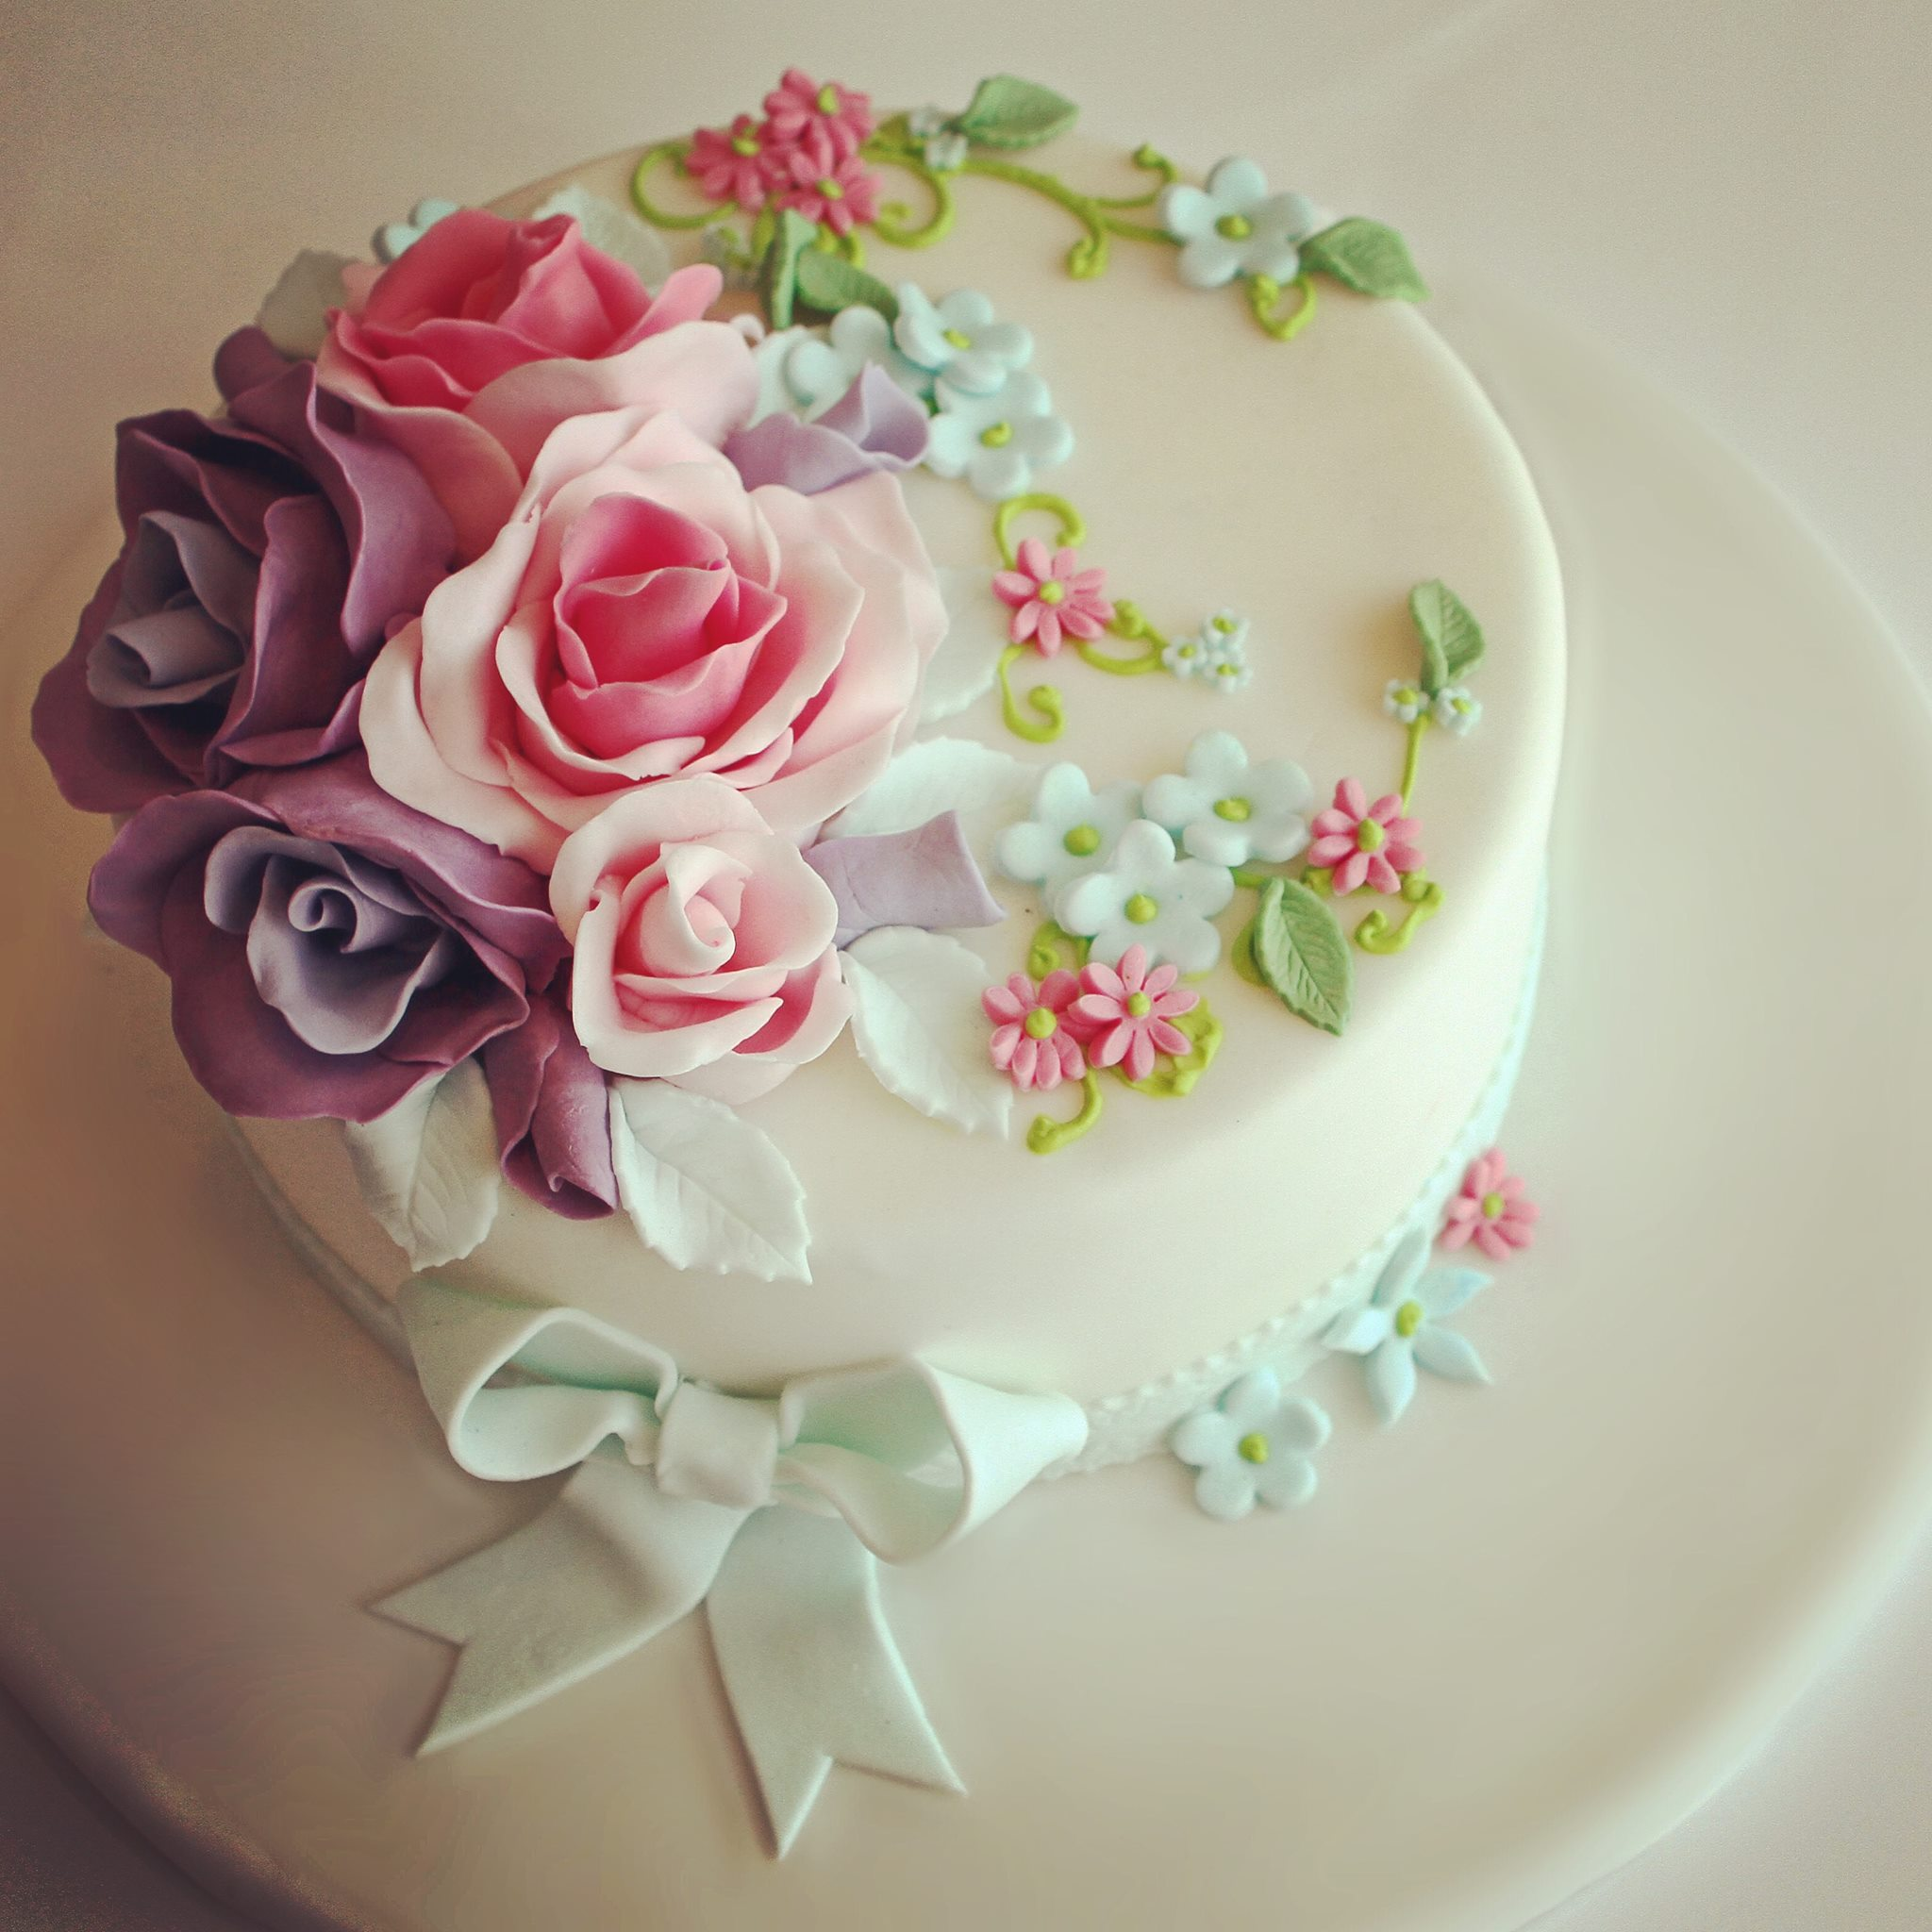 decorated_cake_3.jpg